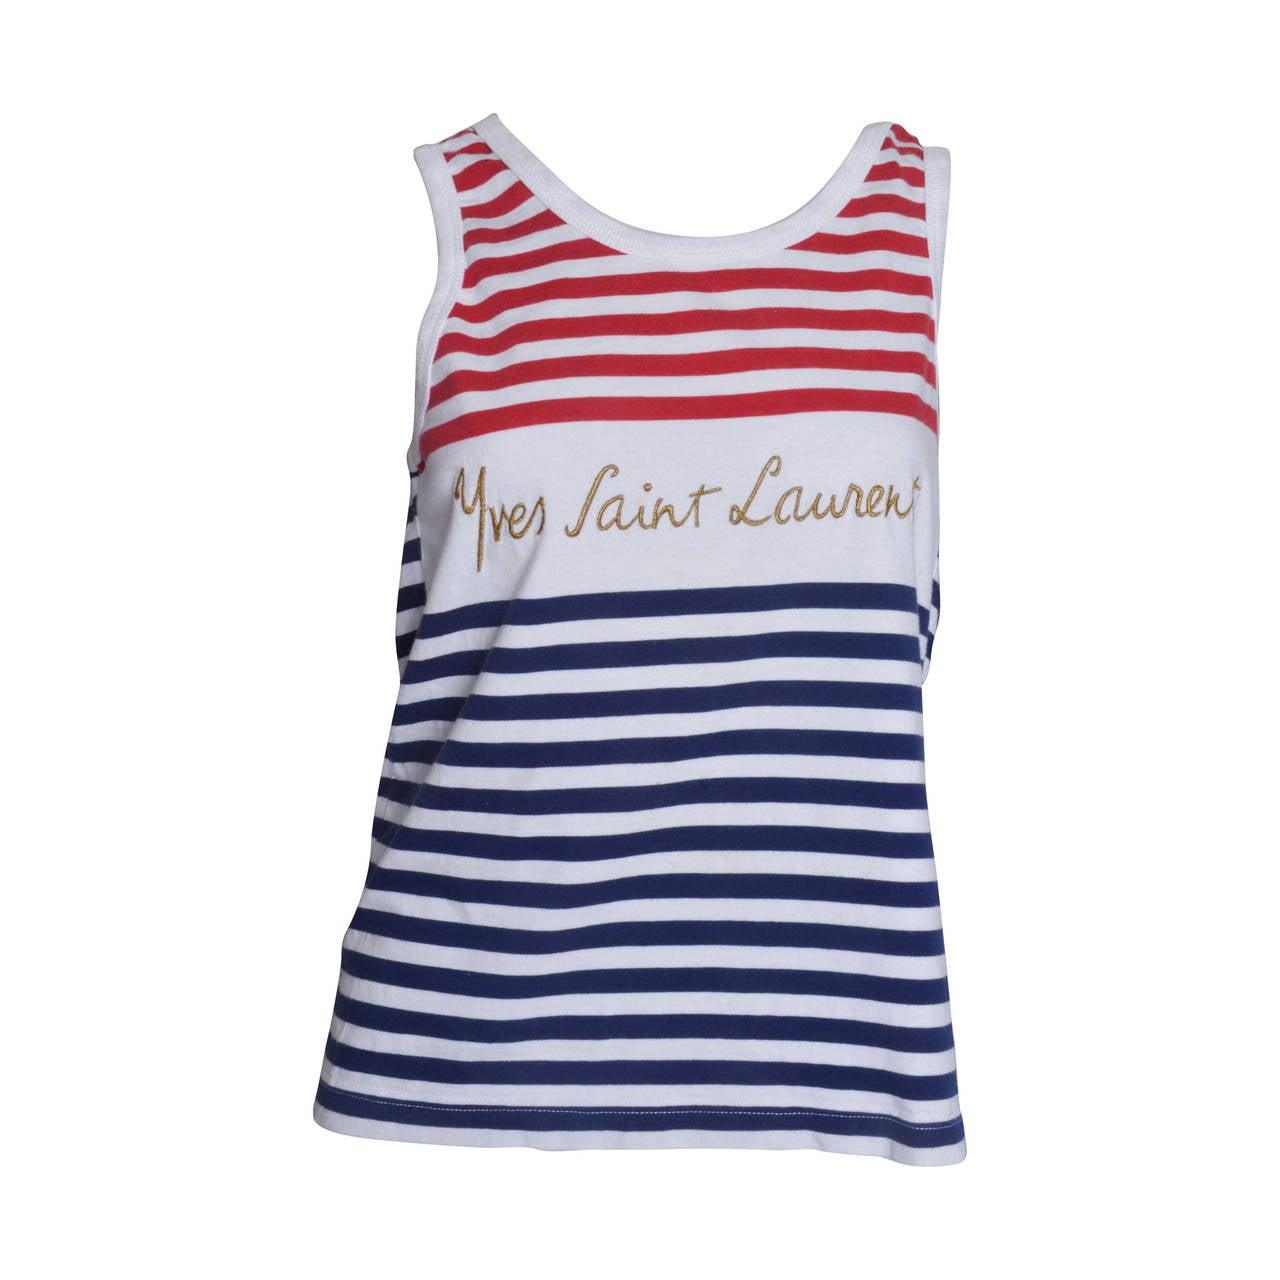 Yves Saint Lauren Variation Striped Signature Tank 1